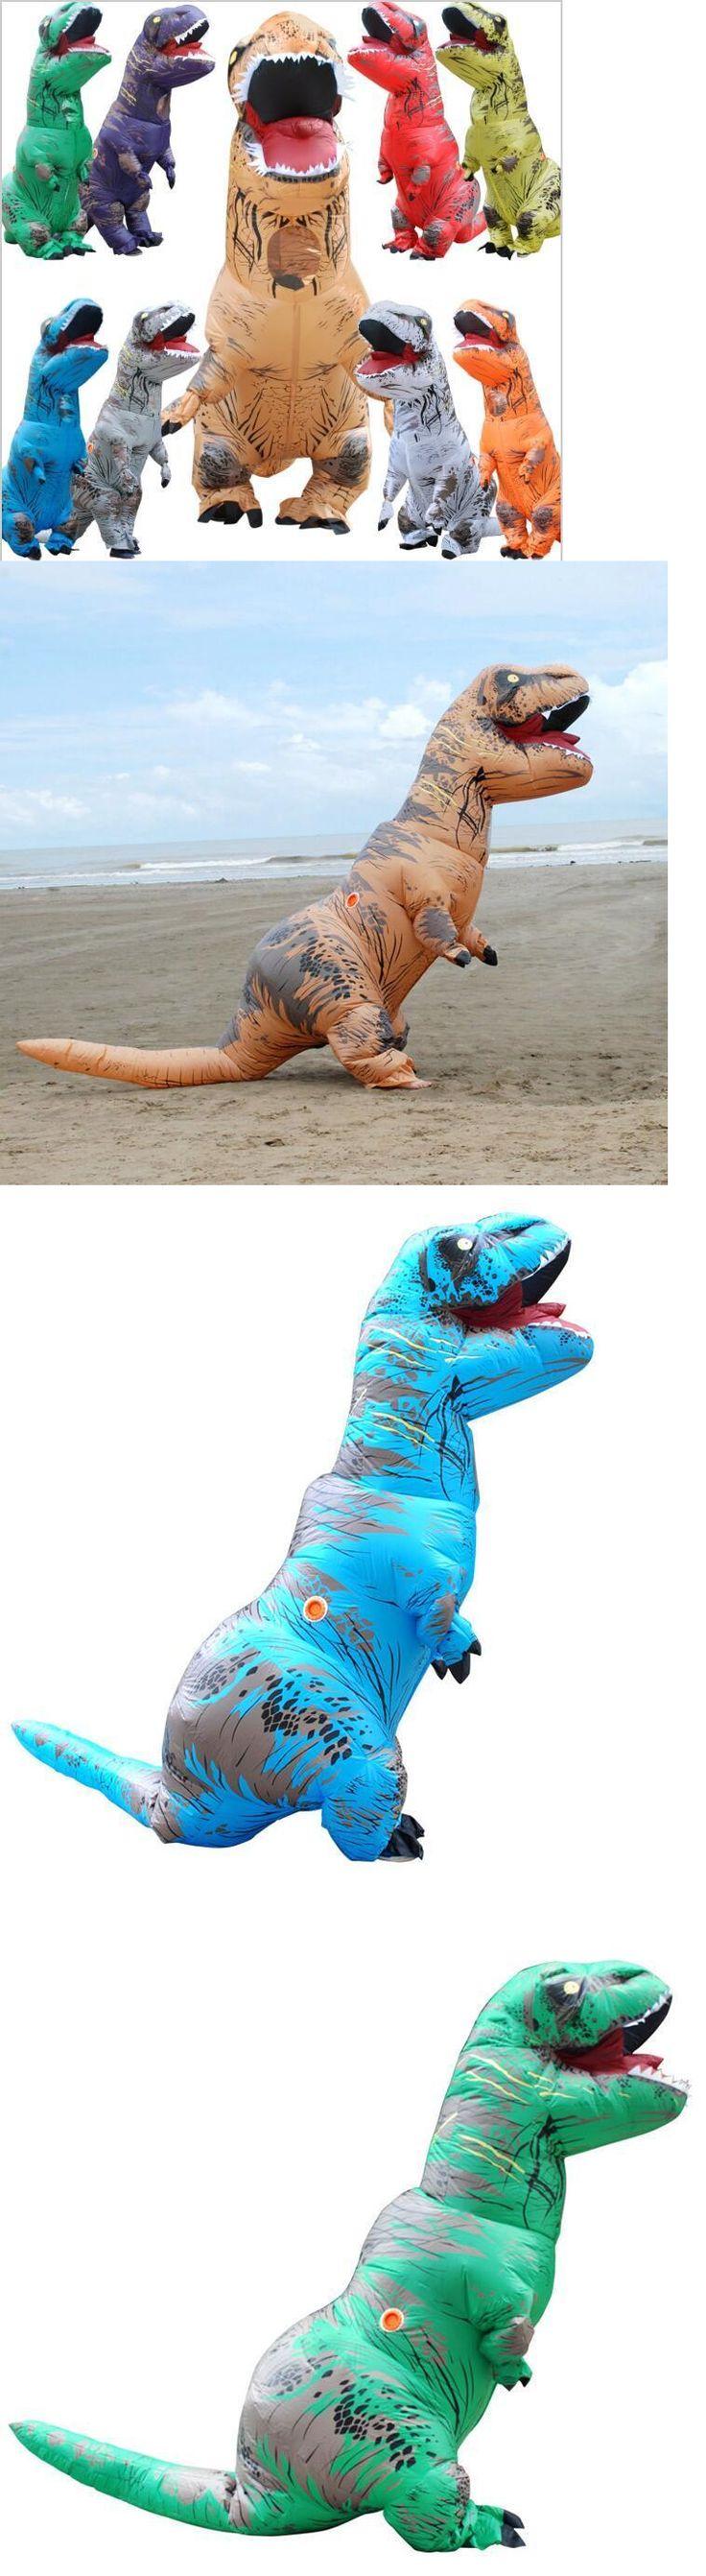 Best 25+ Inflatable t rex costume ideas on Pinterest | T rex ...